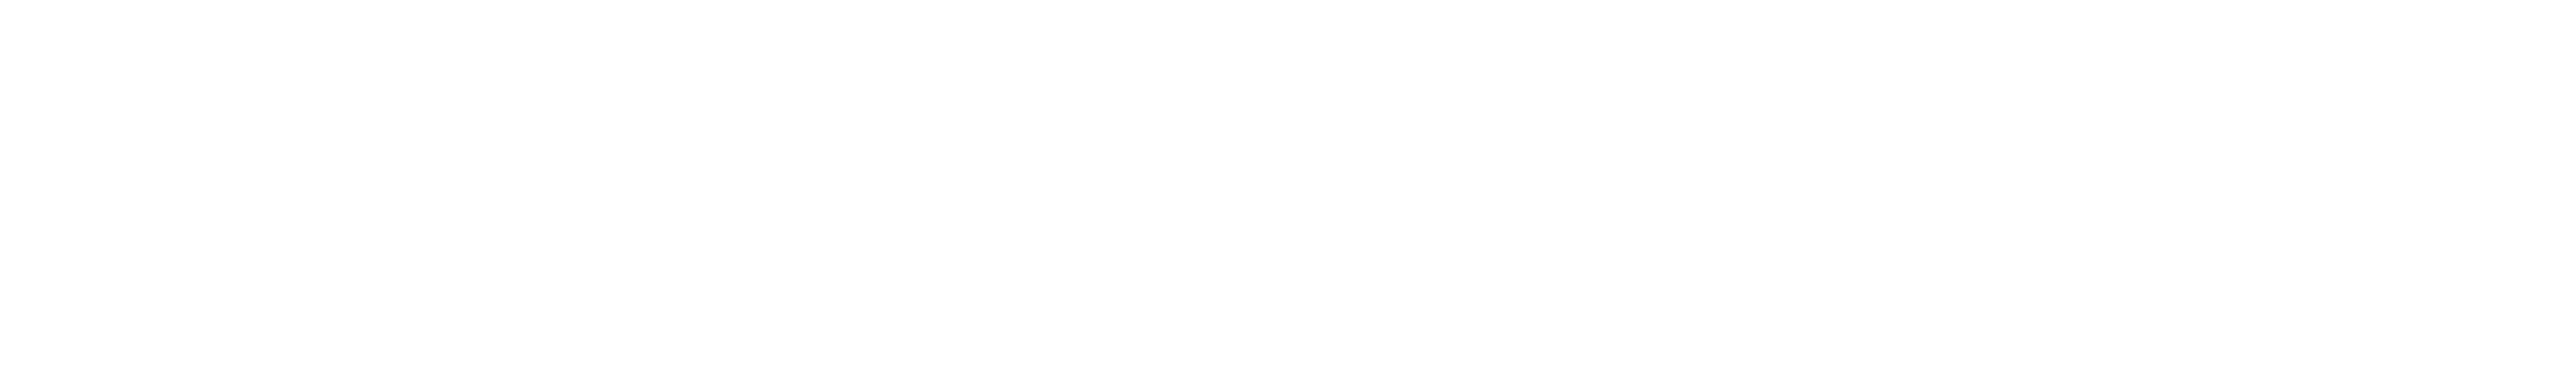 area-download-digital-dictionary